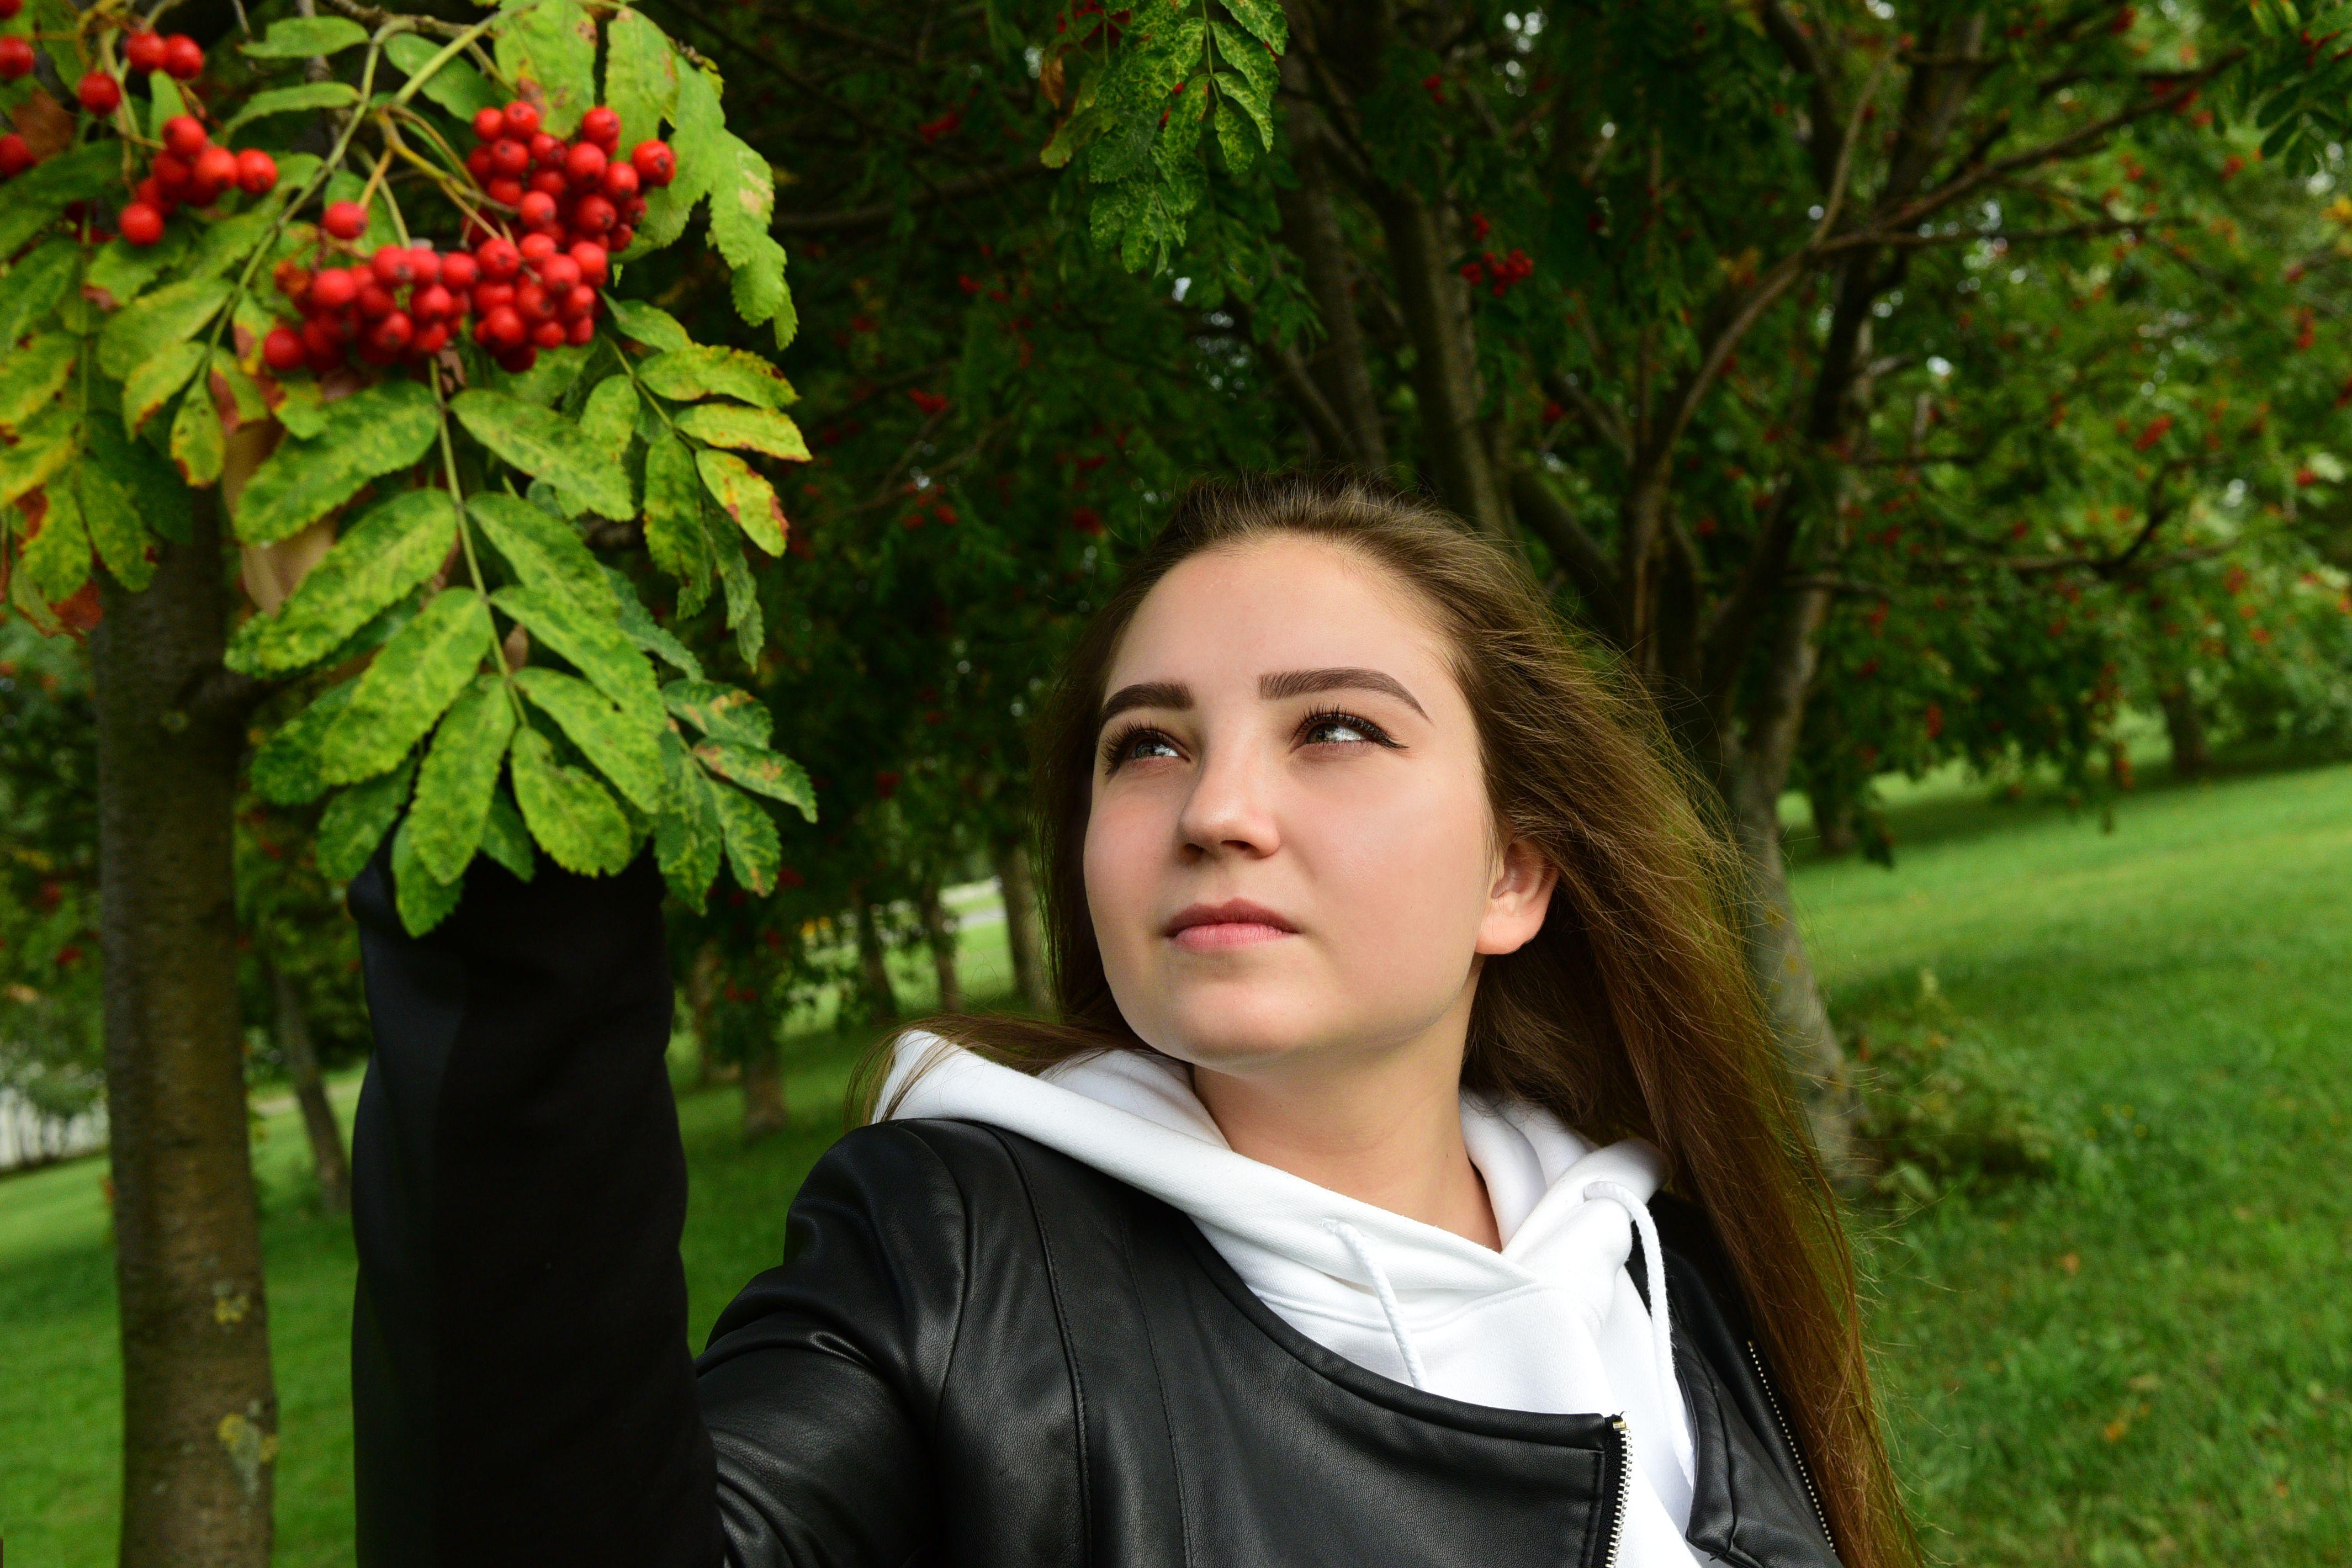 Синоптики пообещали москвичам до 13 градусов тепла в среду